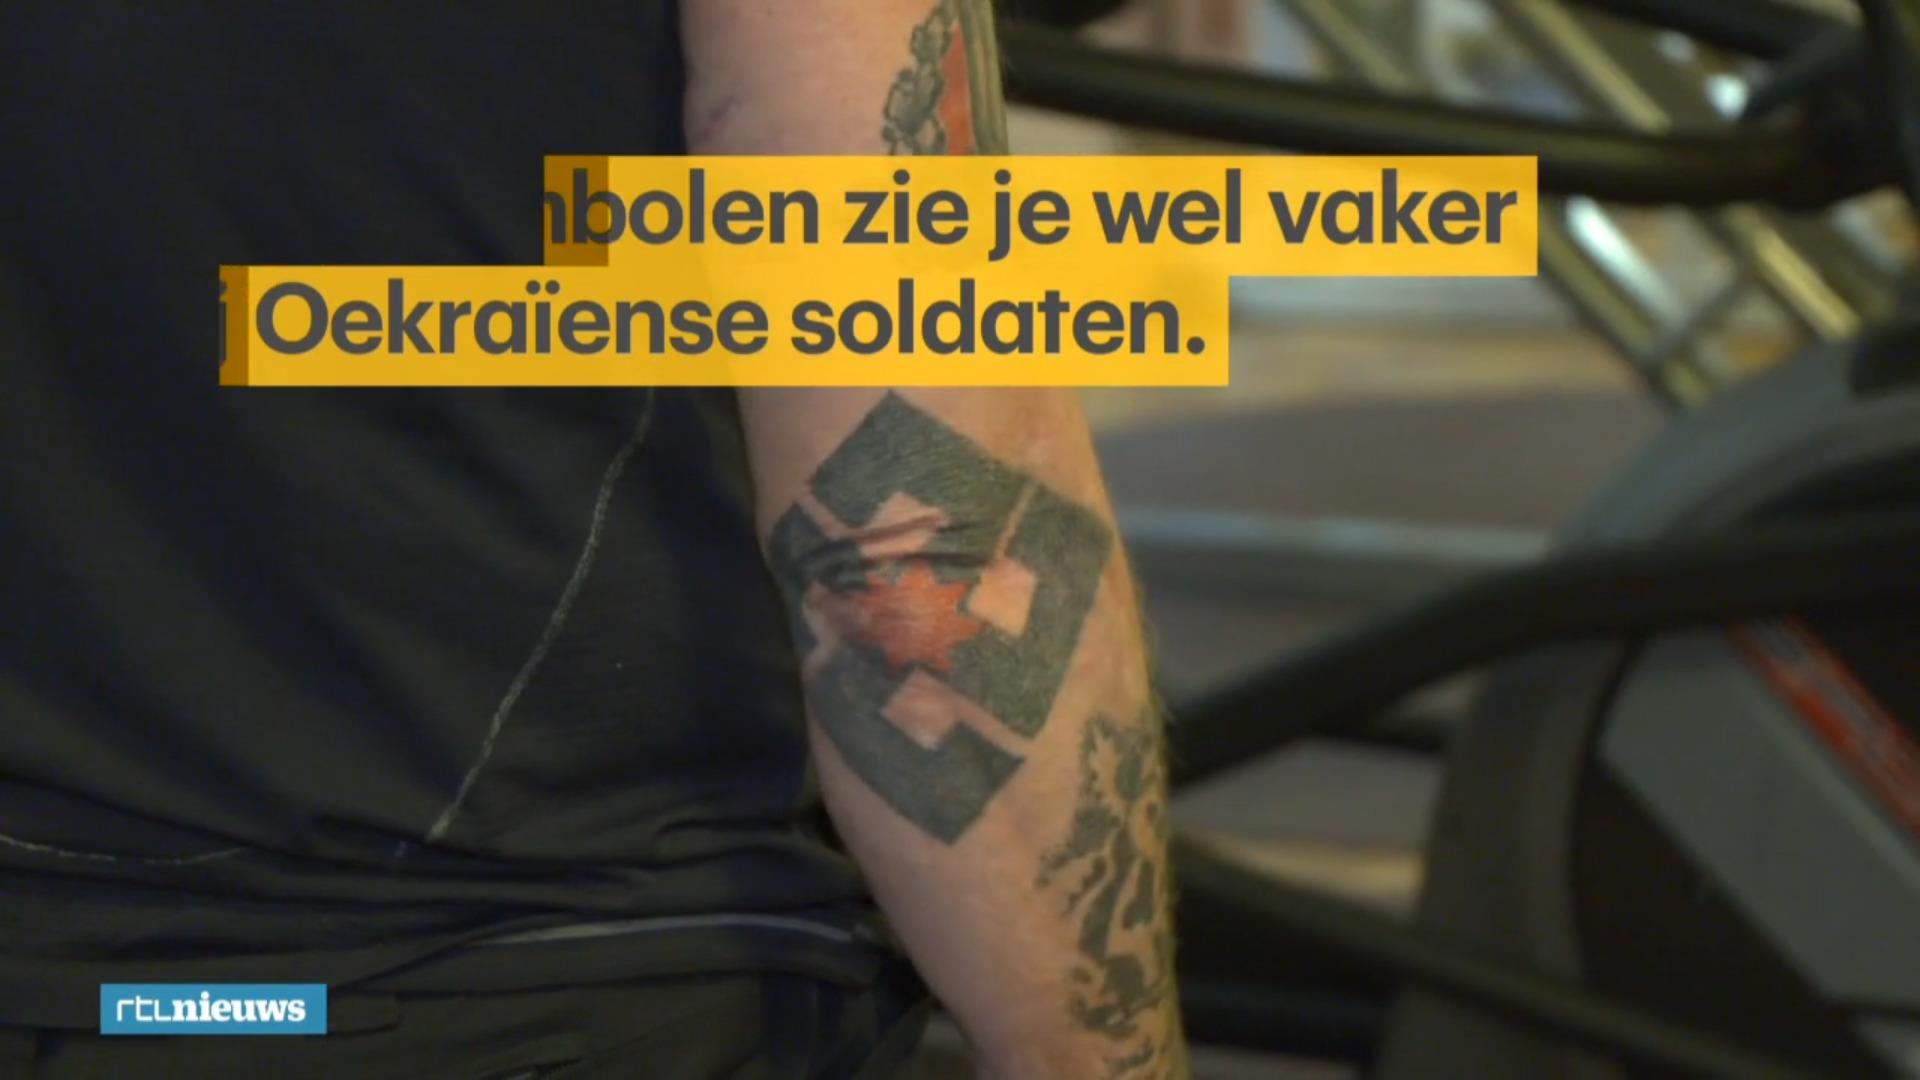 """My Swastika has Curved Edges, I am not a Nazi"": Ukrainian Defender Of Democracy To Dutch Media"